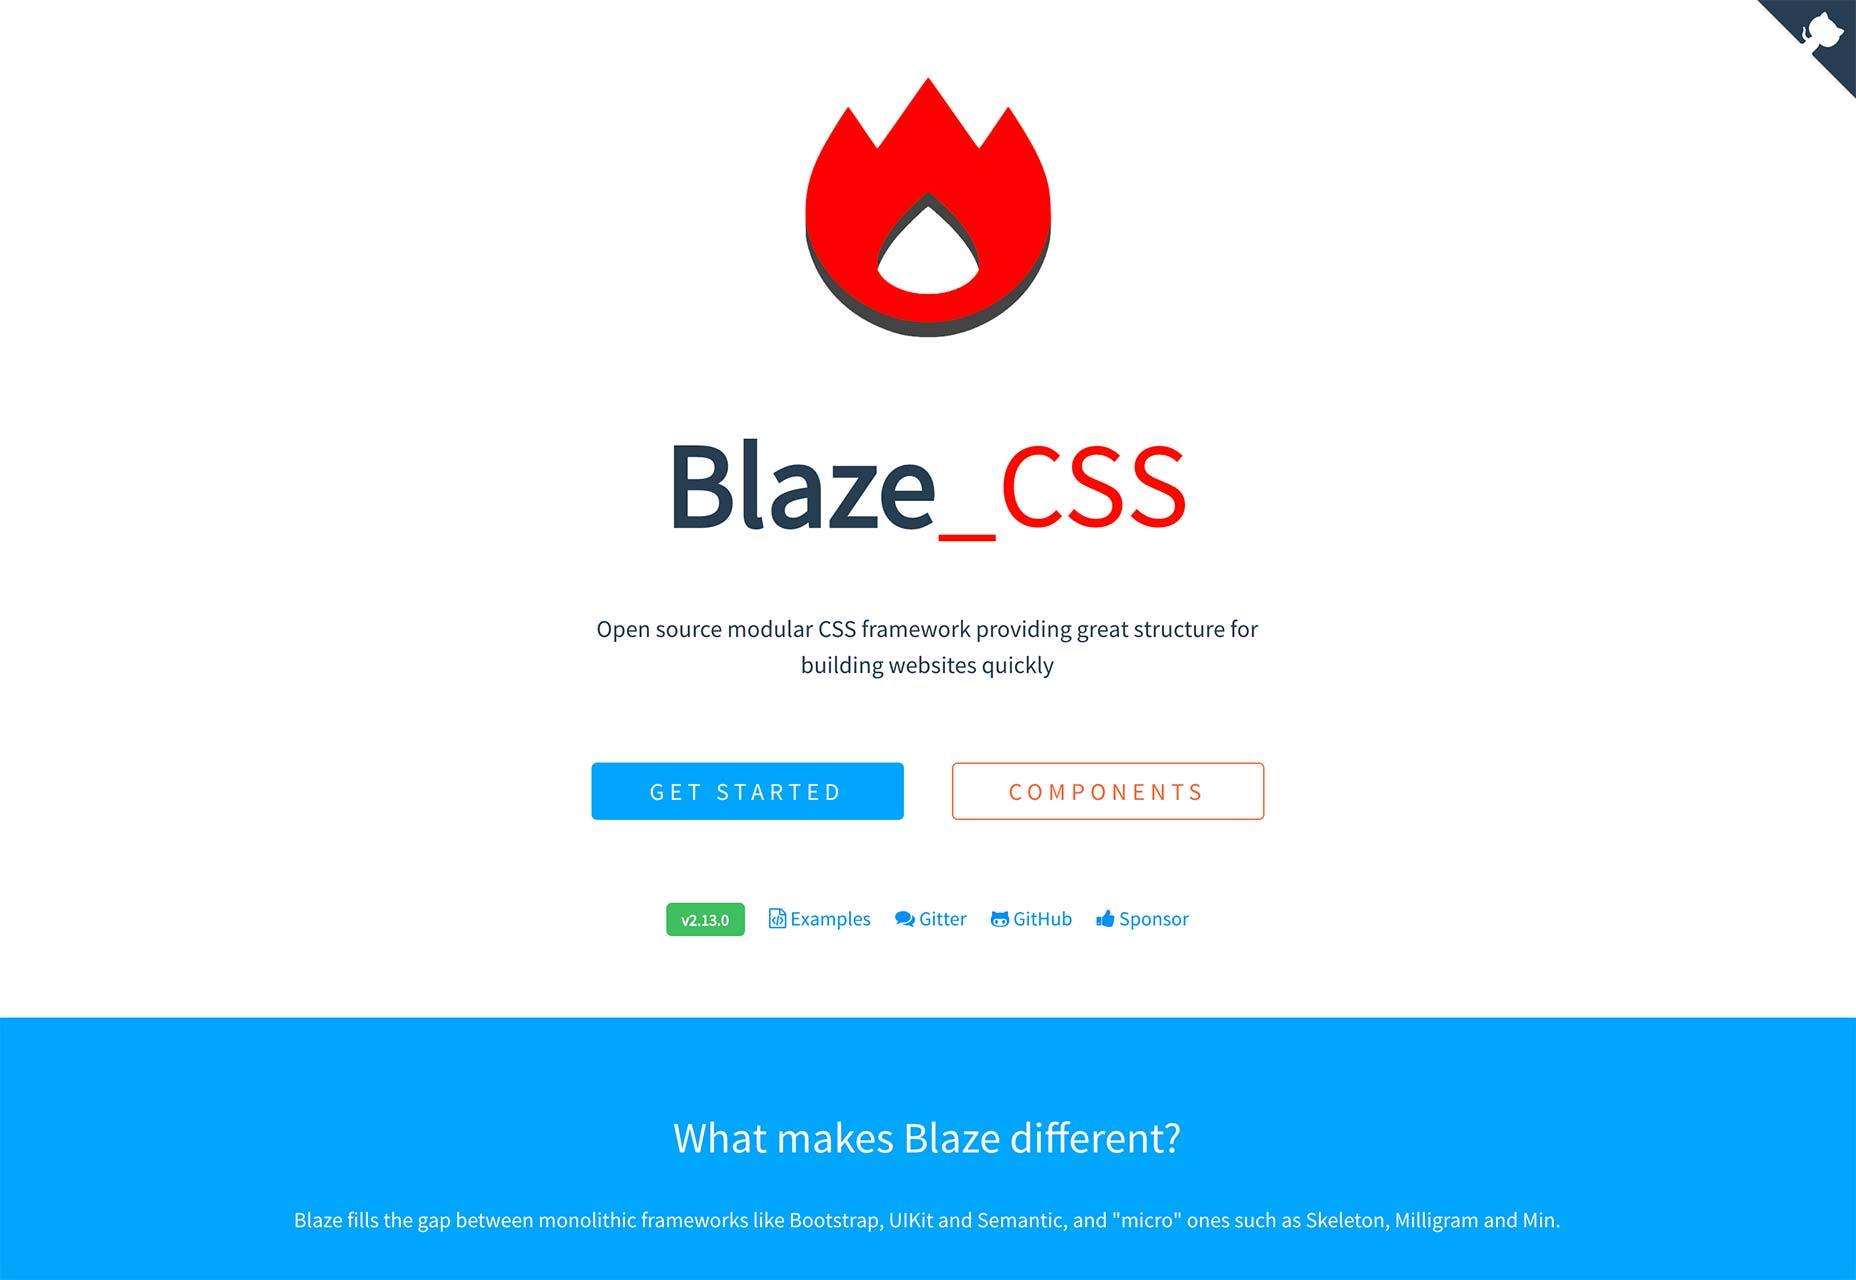 26blaze_css